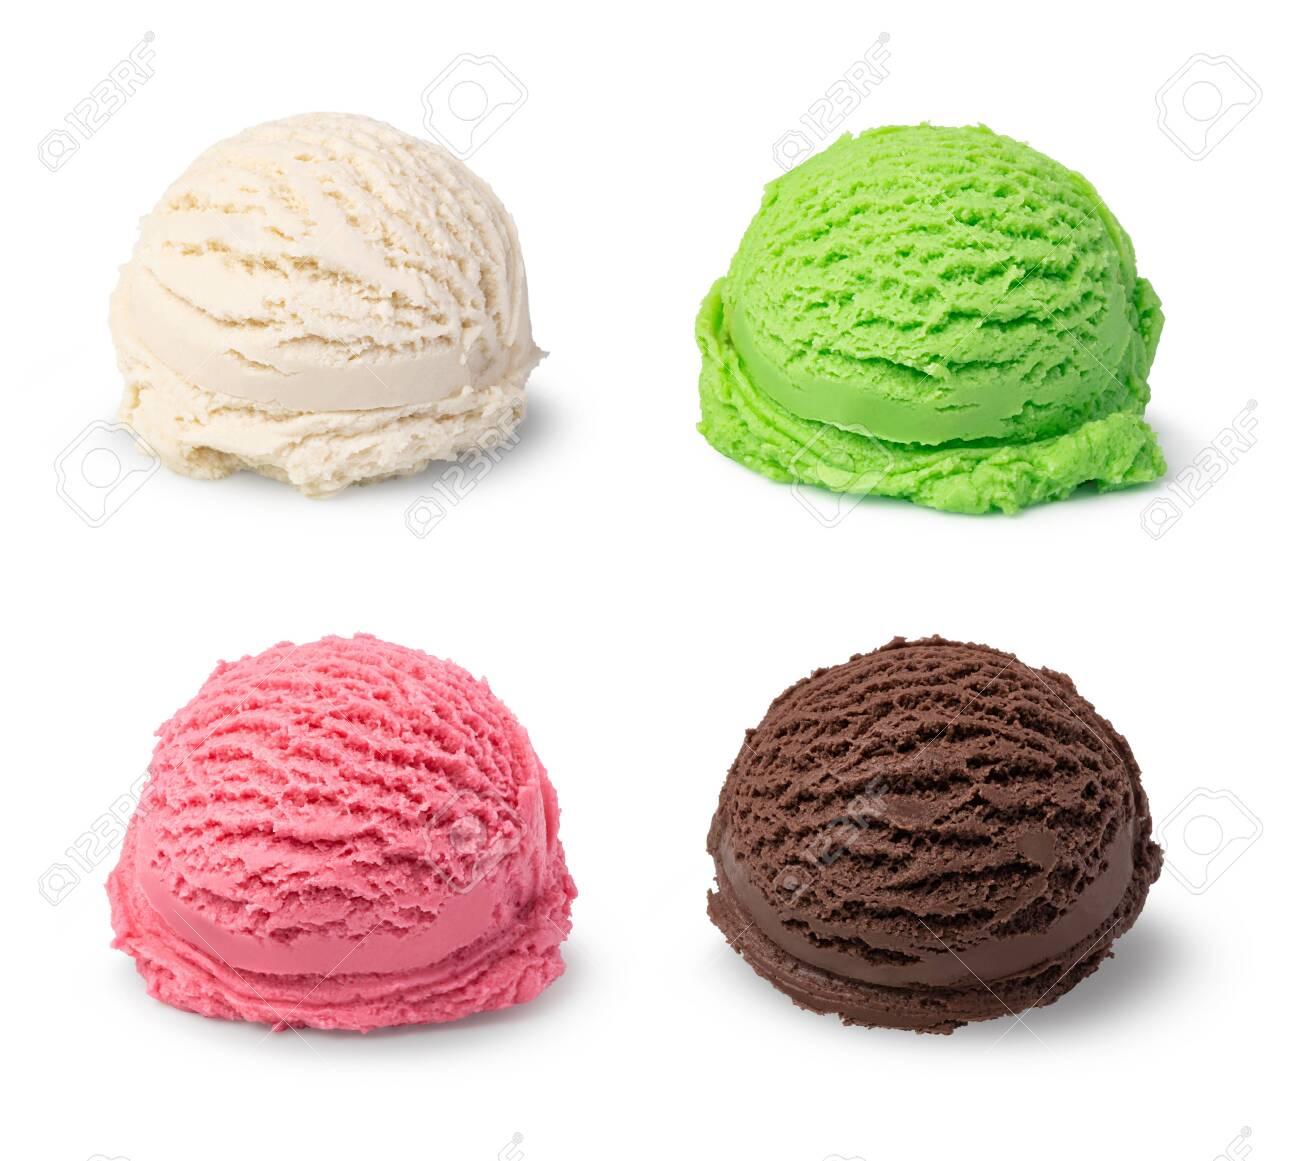 ice cream ball isolated on white background - 120863495